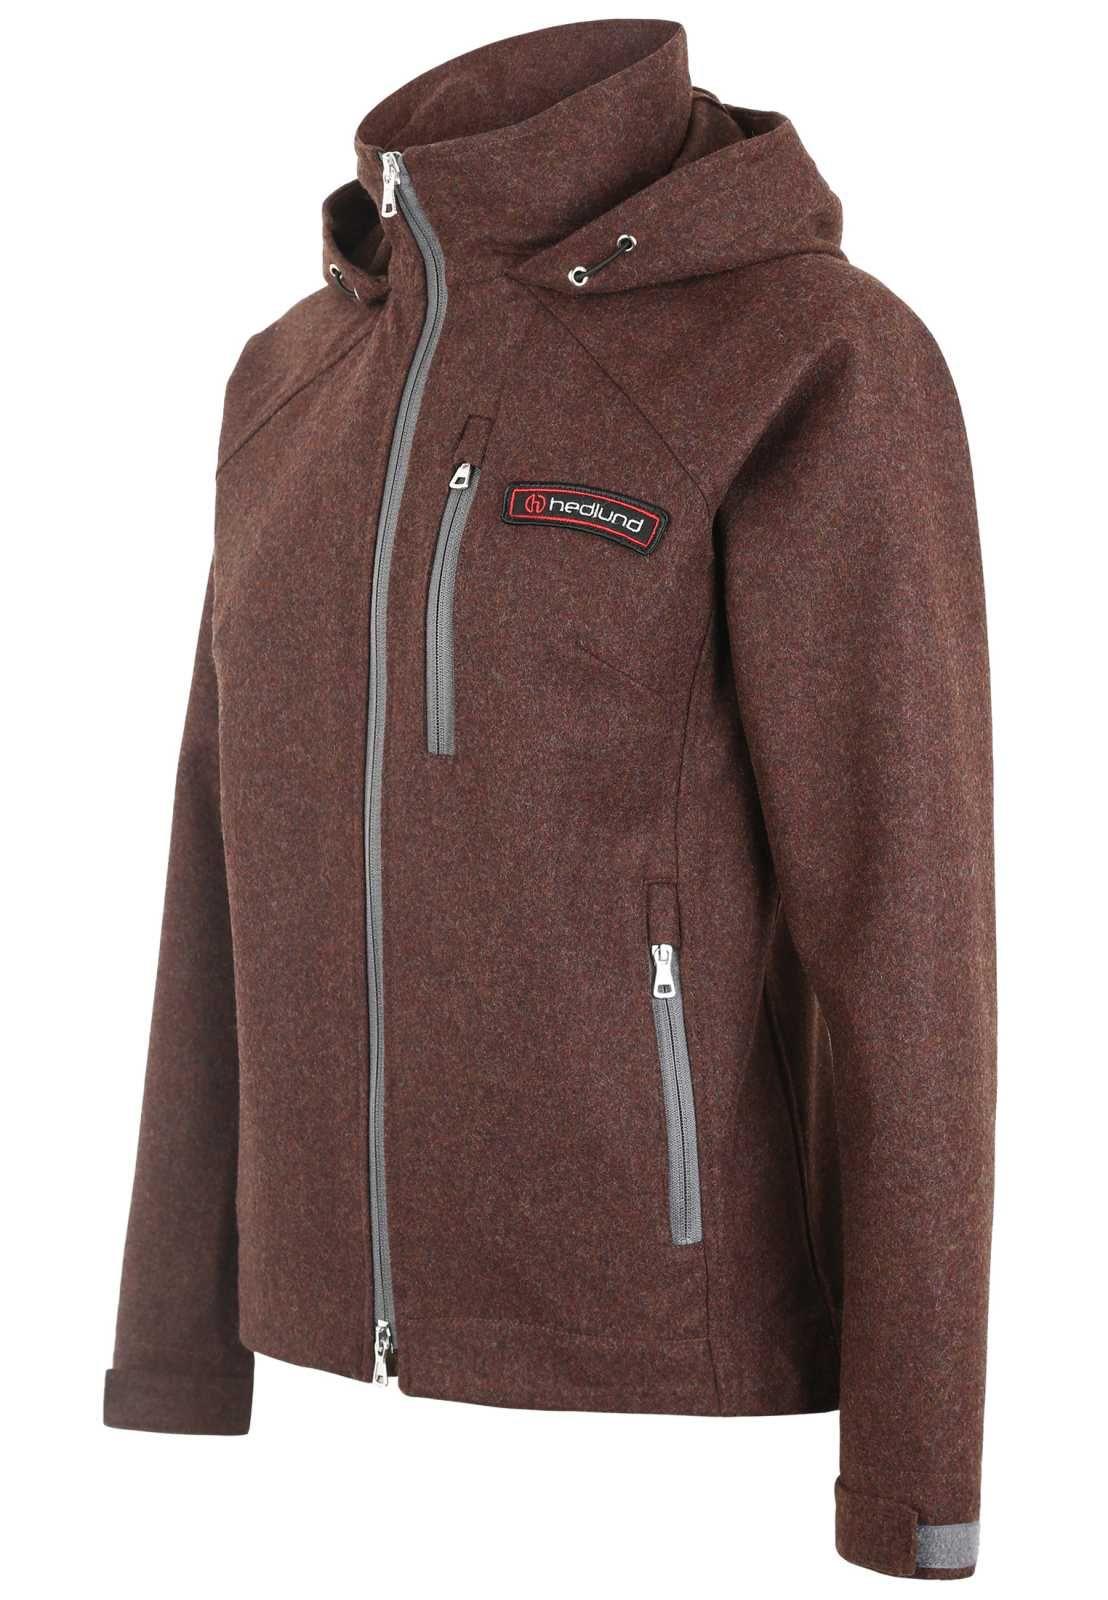 bd401fa567 hedlund Merino Windbreaker - Gilja light | hedlund Outdoorbekleidung ...